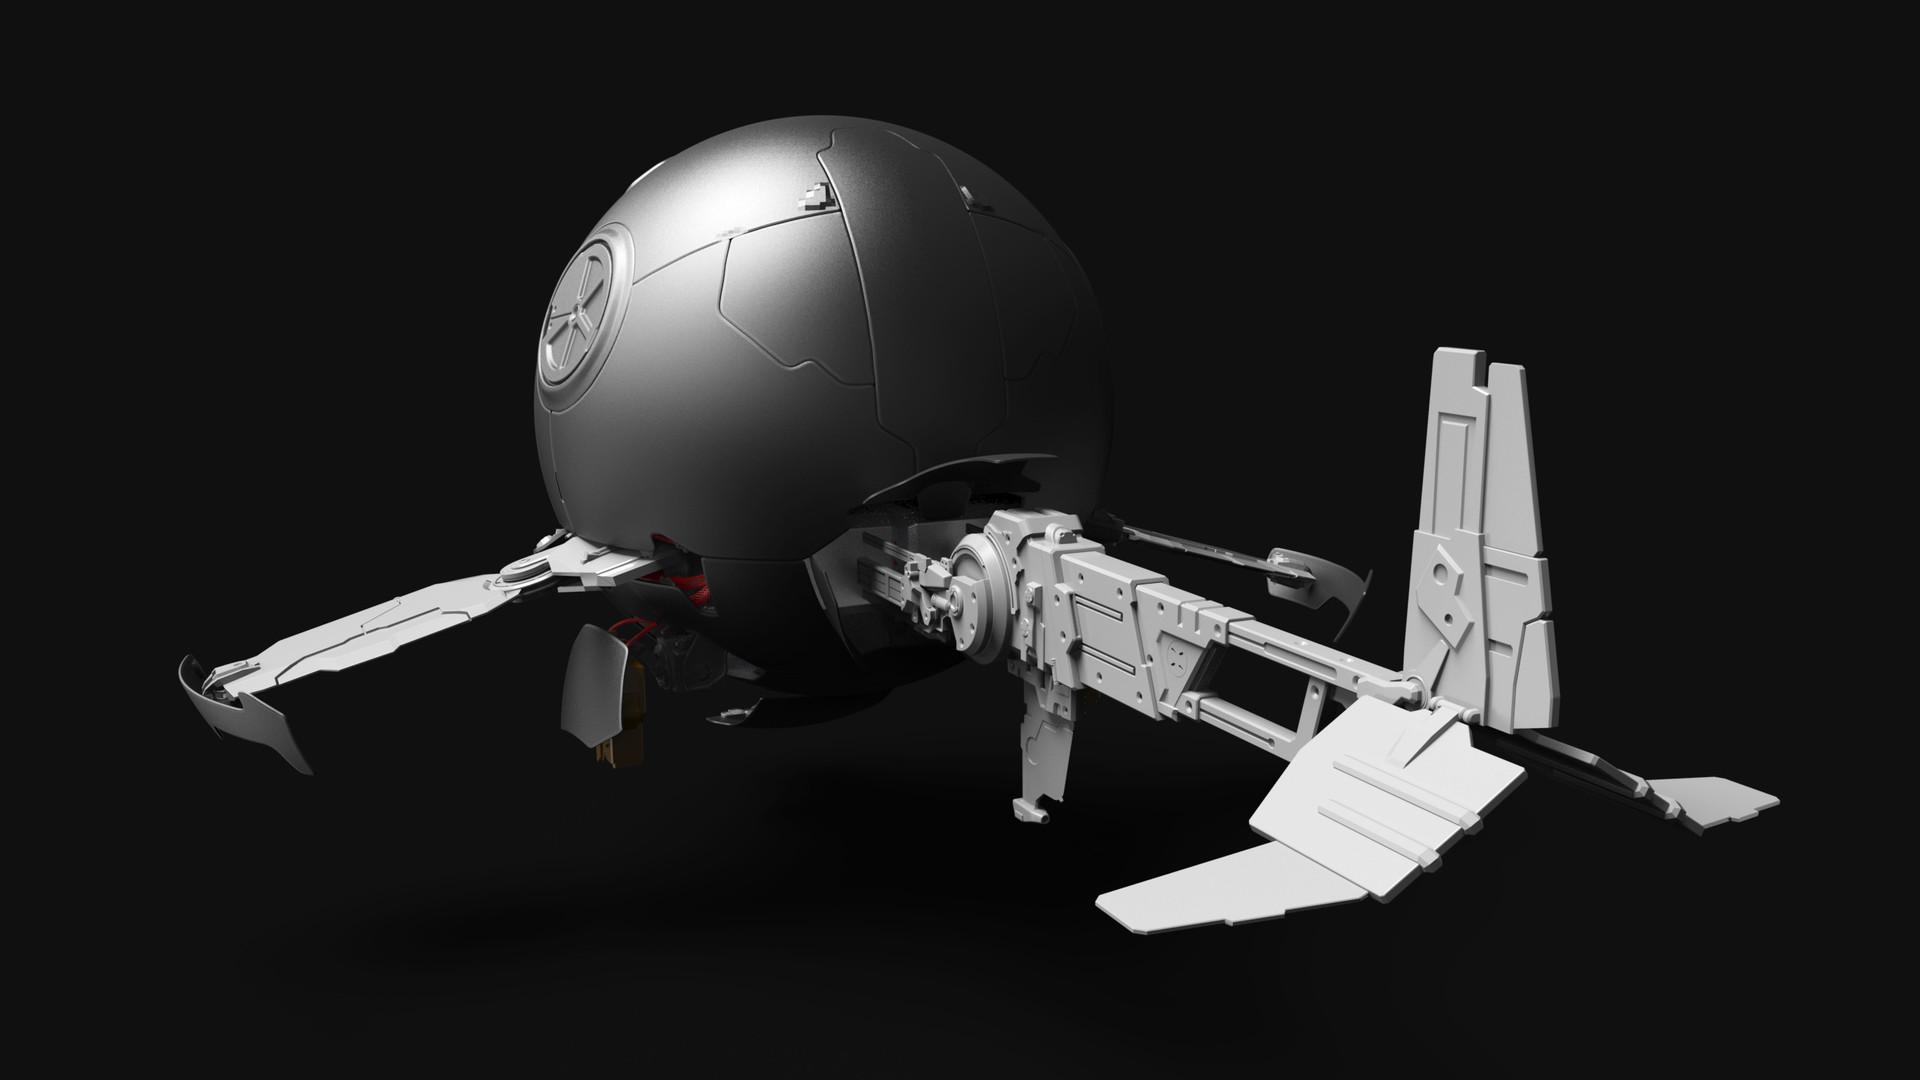 Vojtech lacina drone2